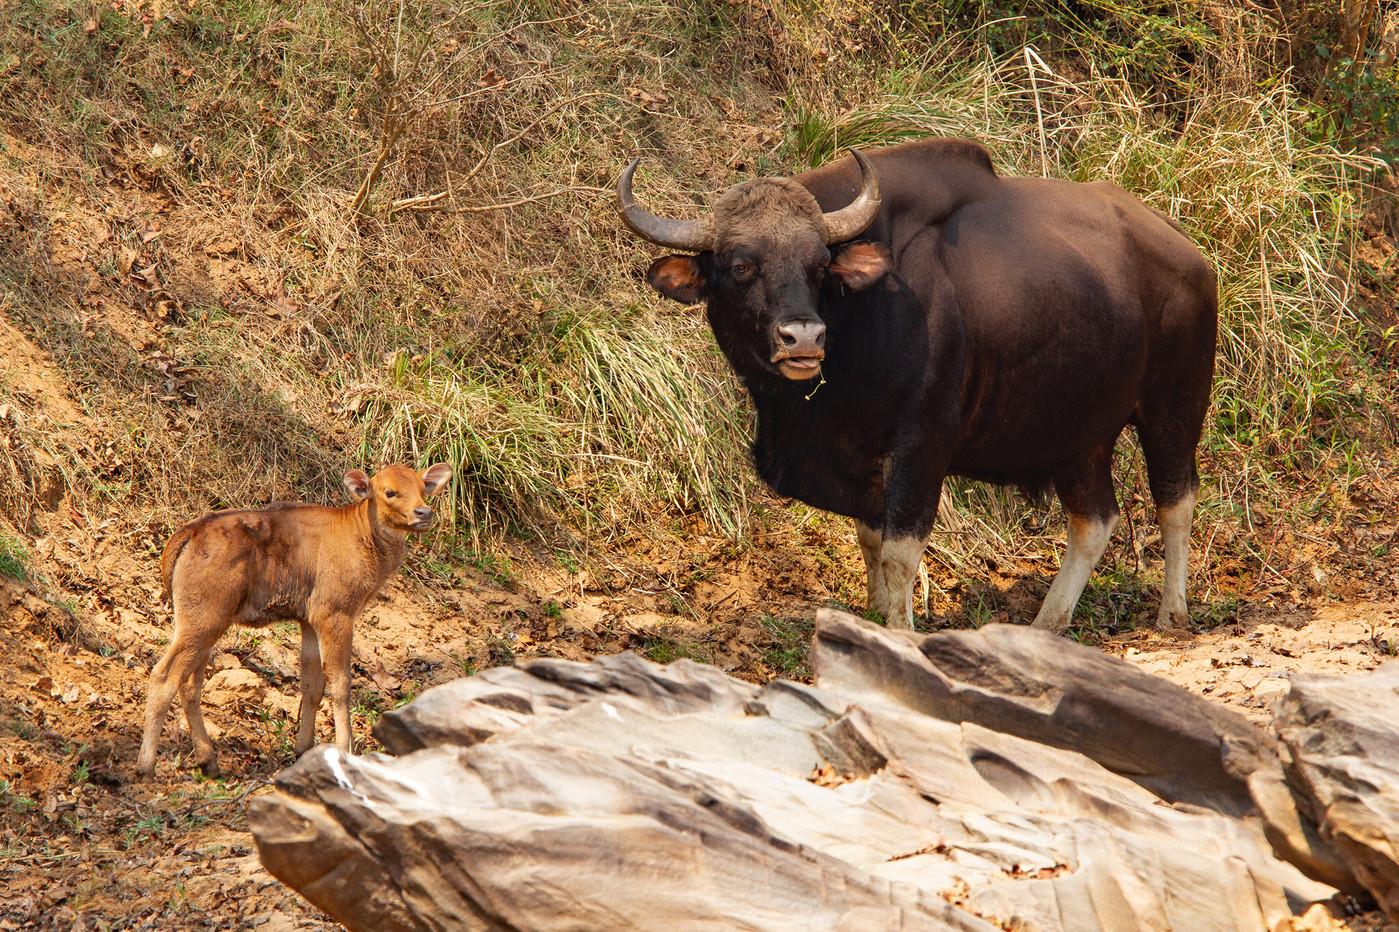 Gaur bull & calf in Kanha NP, India